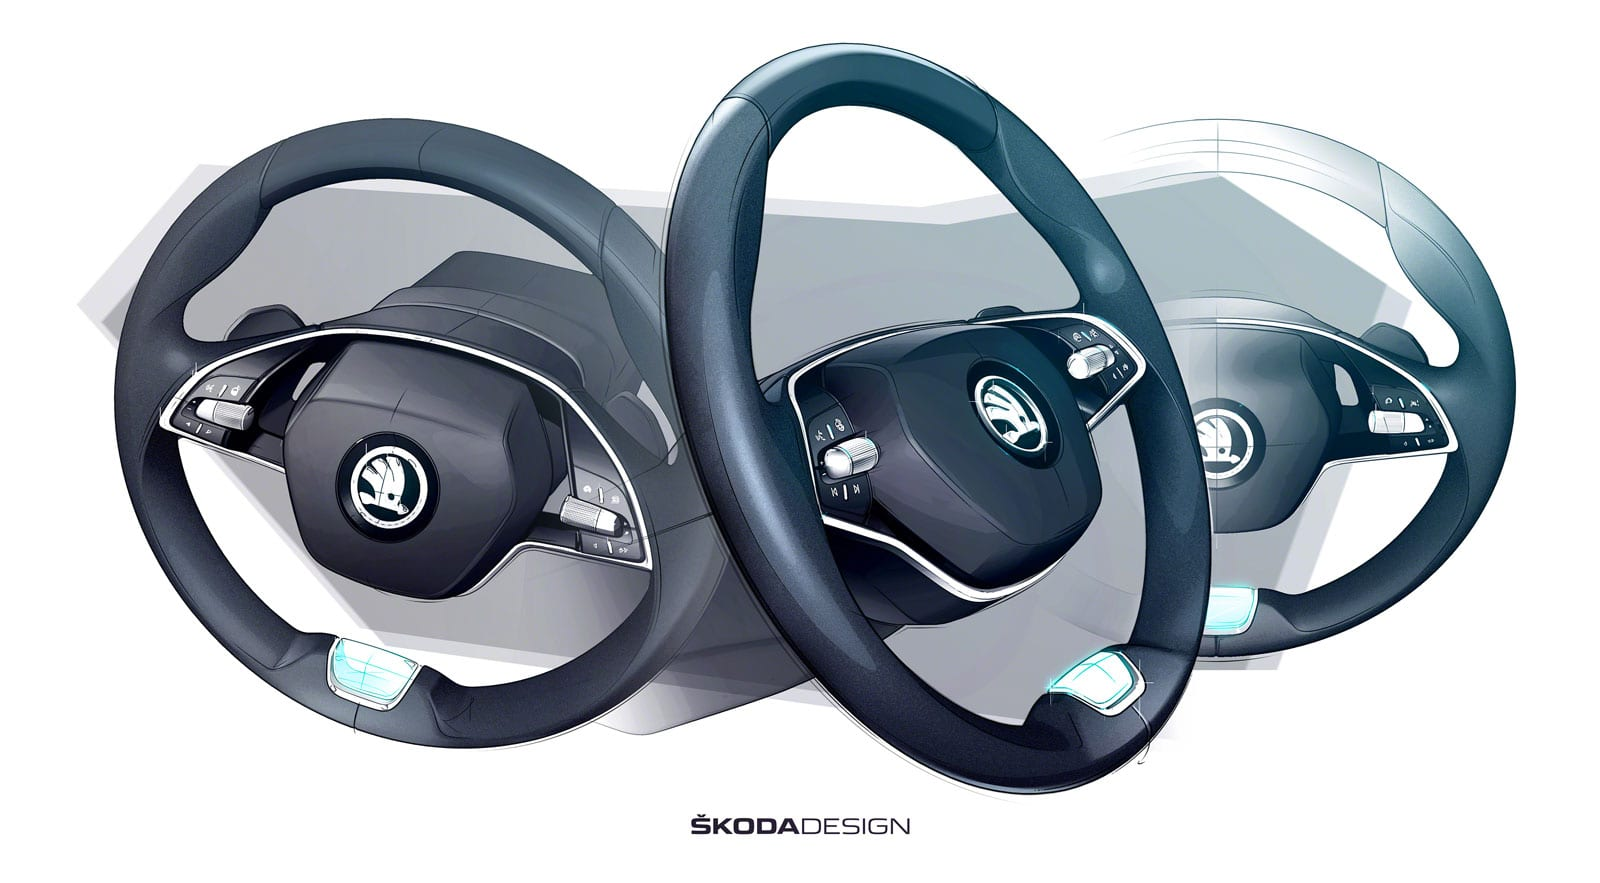 2020 Škoda Octavia Interior